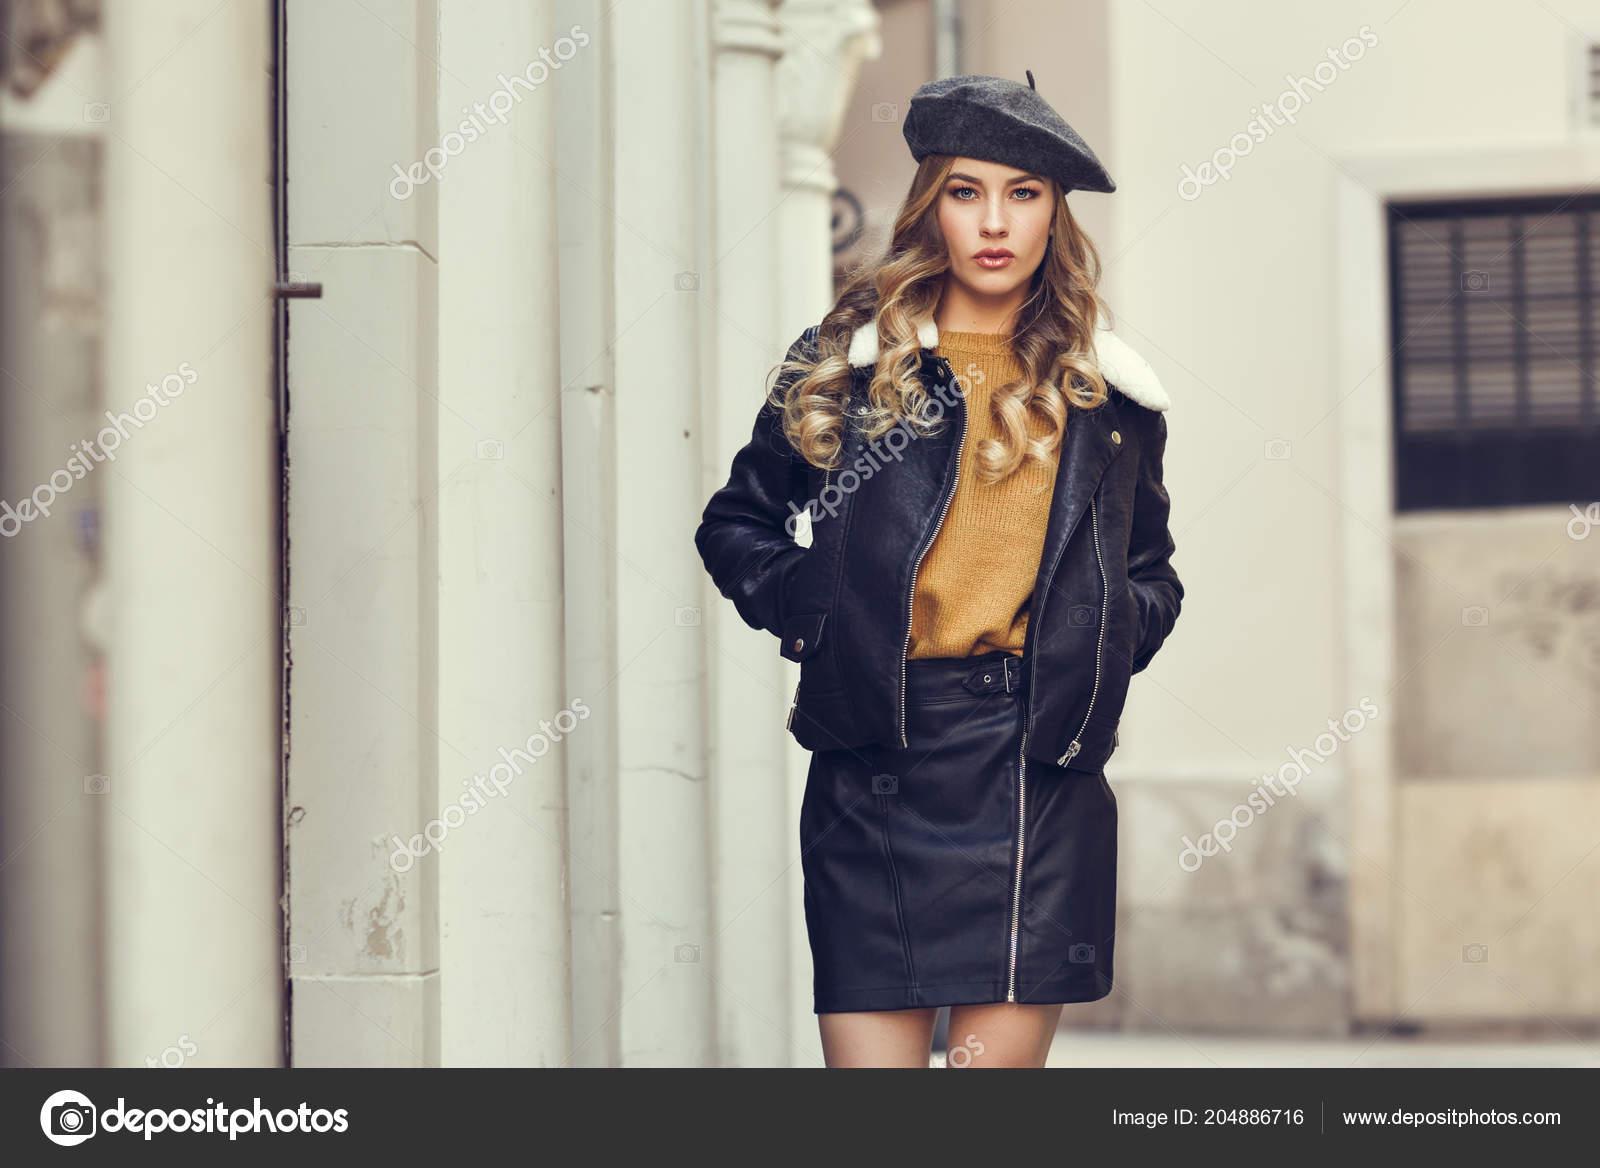 Mujer Rusa Rubia Fondo Urbano Hermosa Joven Con Boina